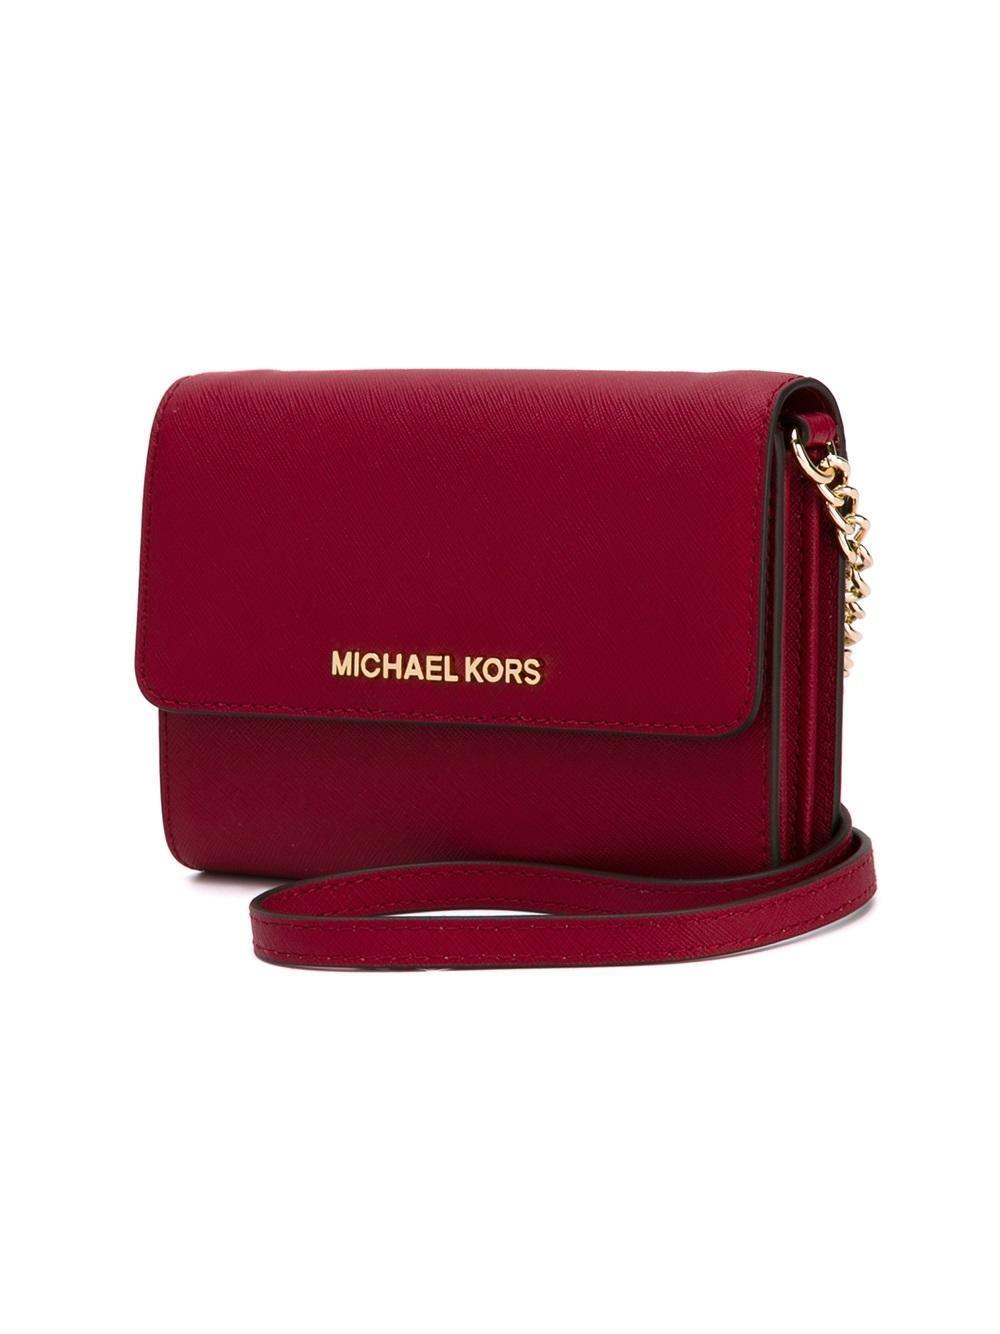 MICHAEL Michael Kors Leather Mini 'jet Set' Crossbody Bag in Red (Pink)